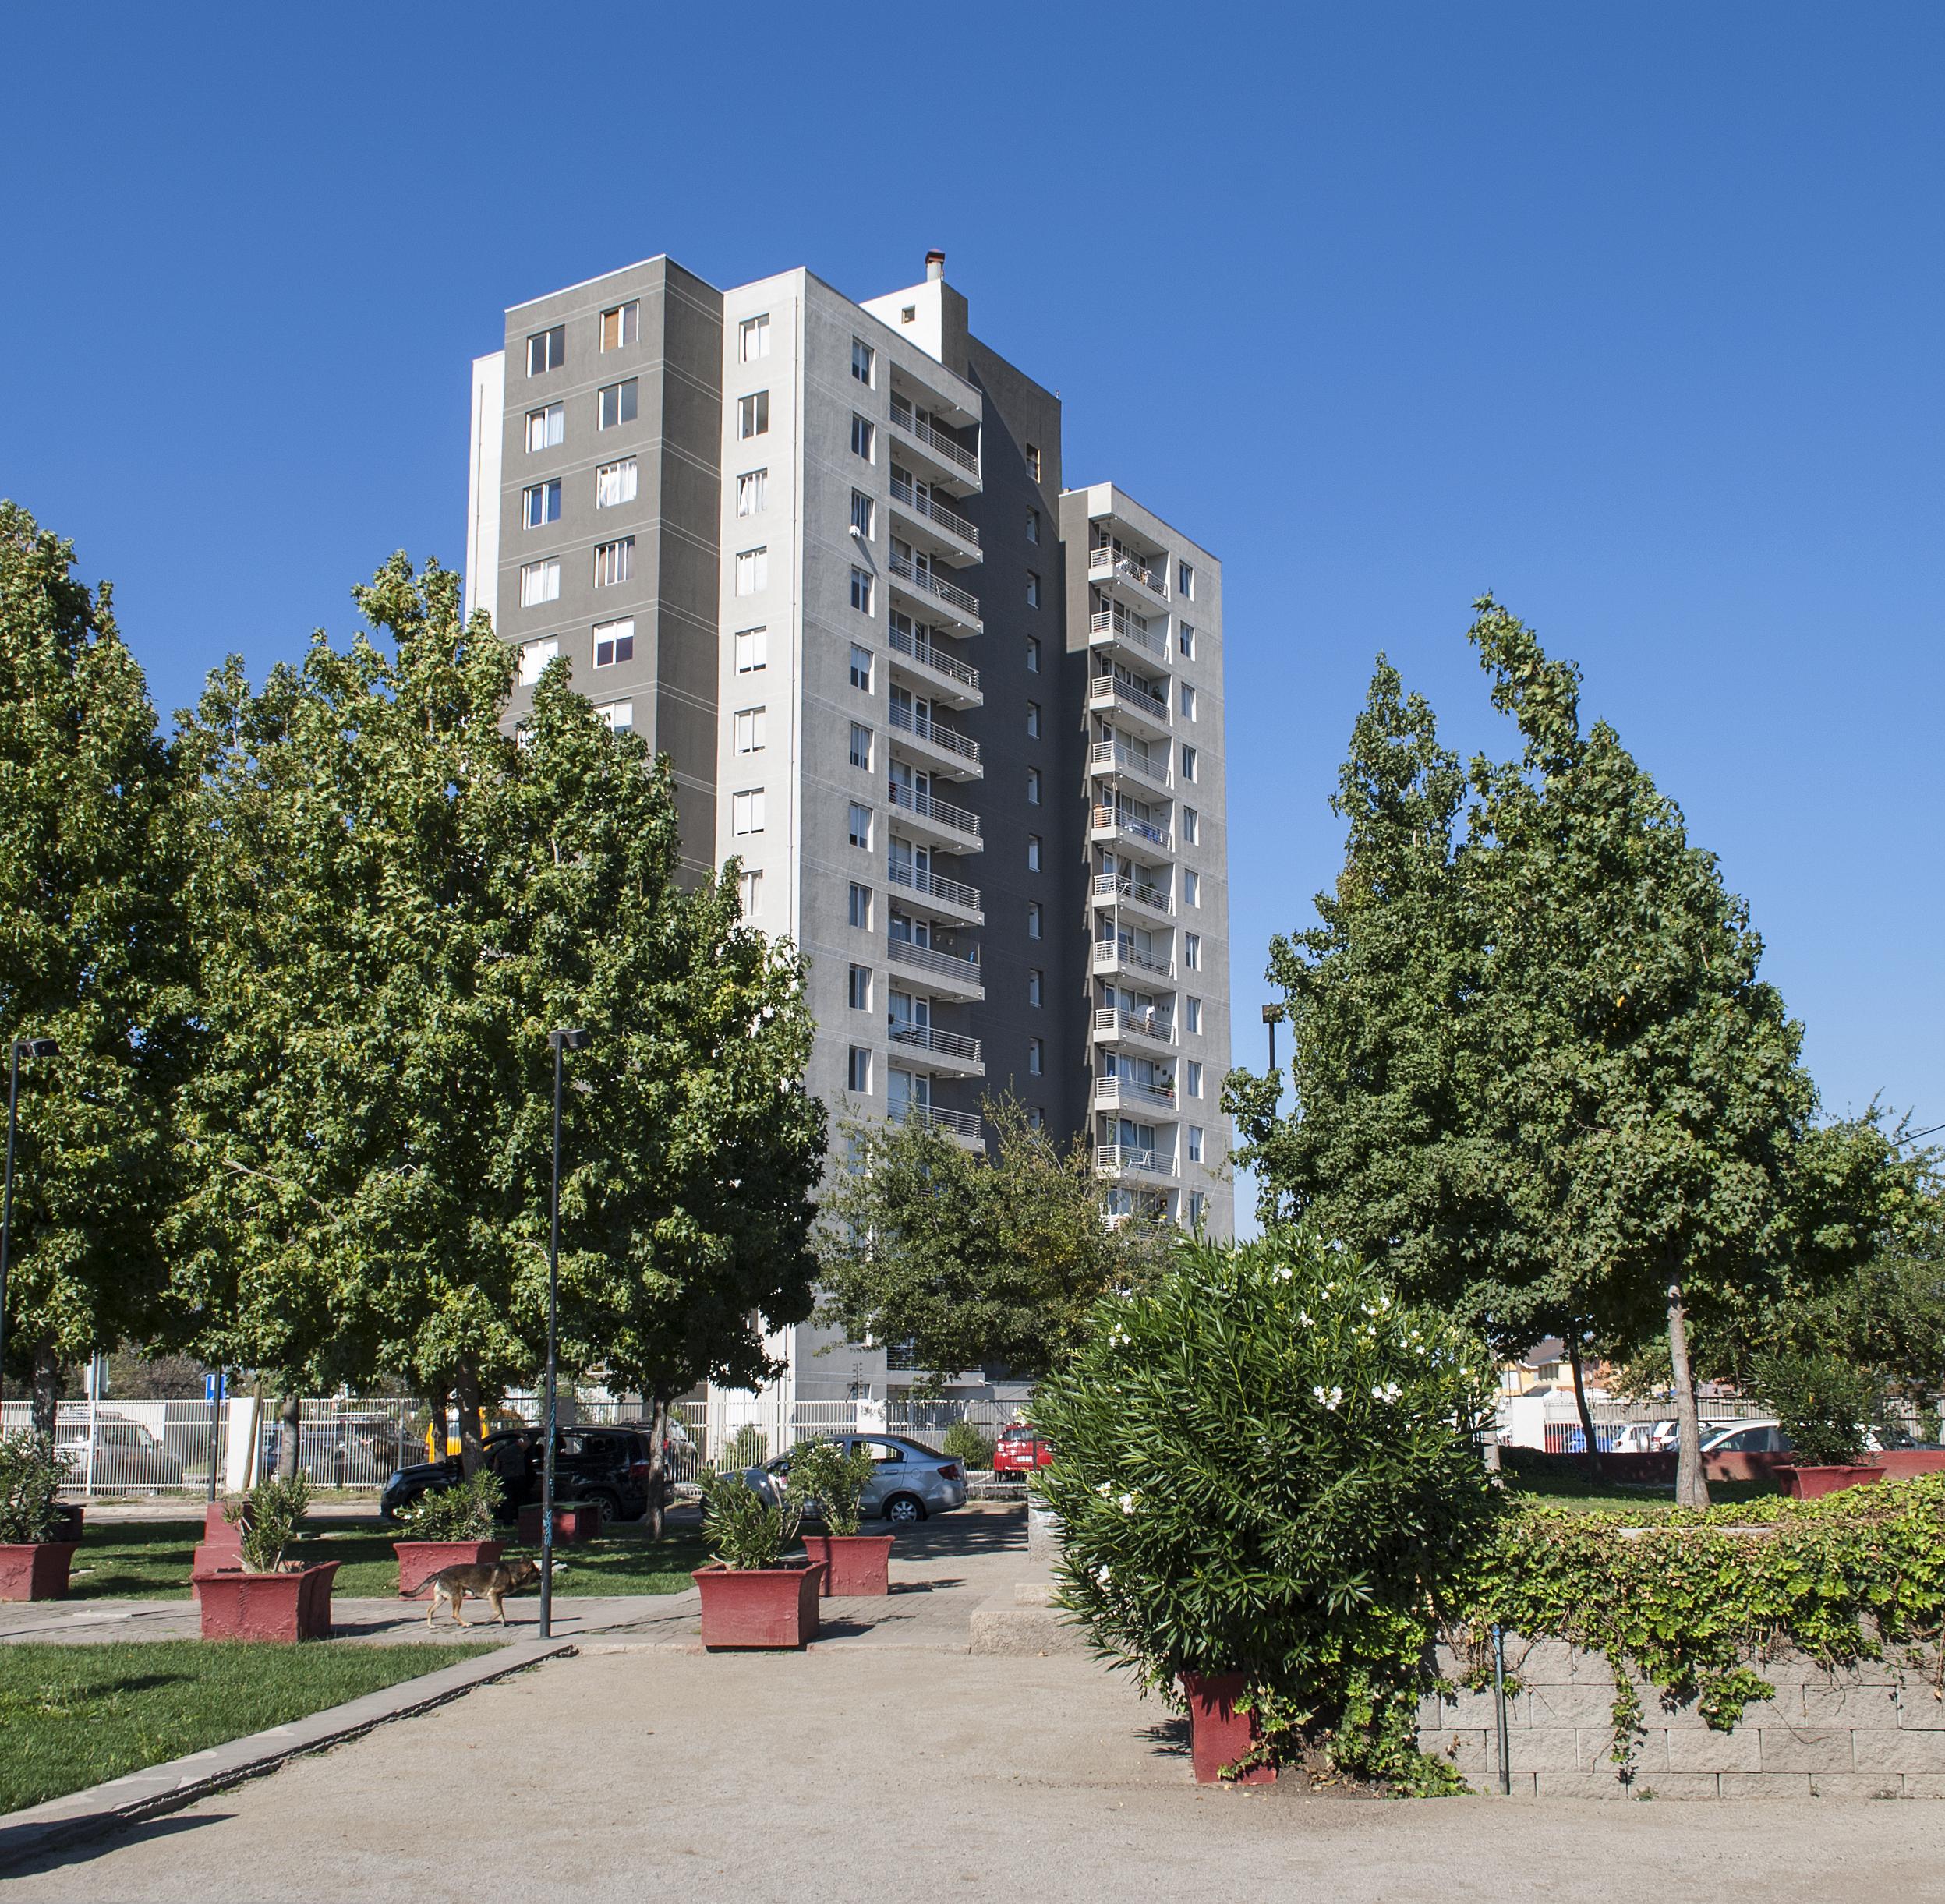 Jardines-del-Valle-Pudahuel-1